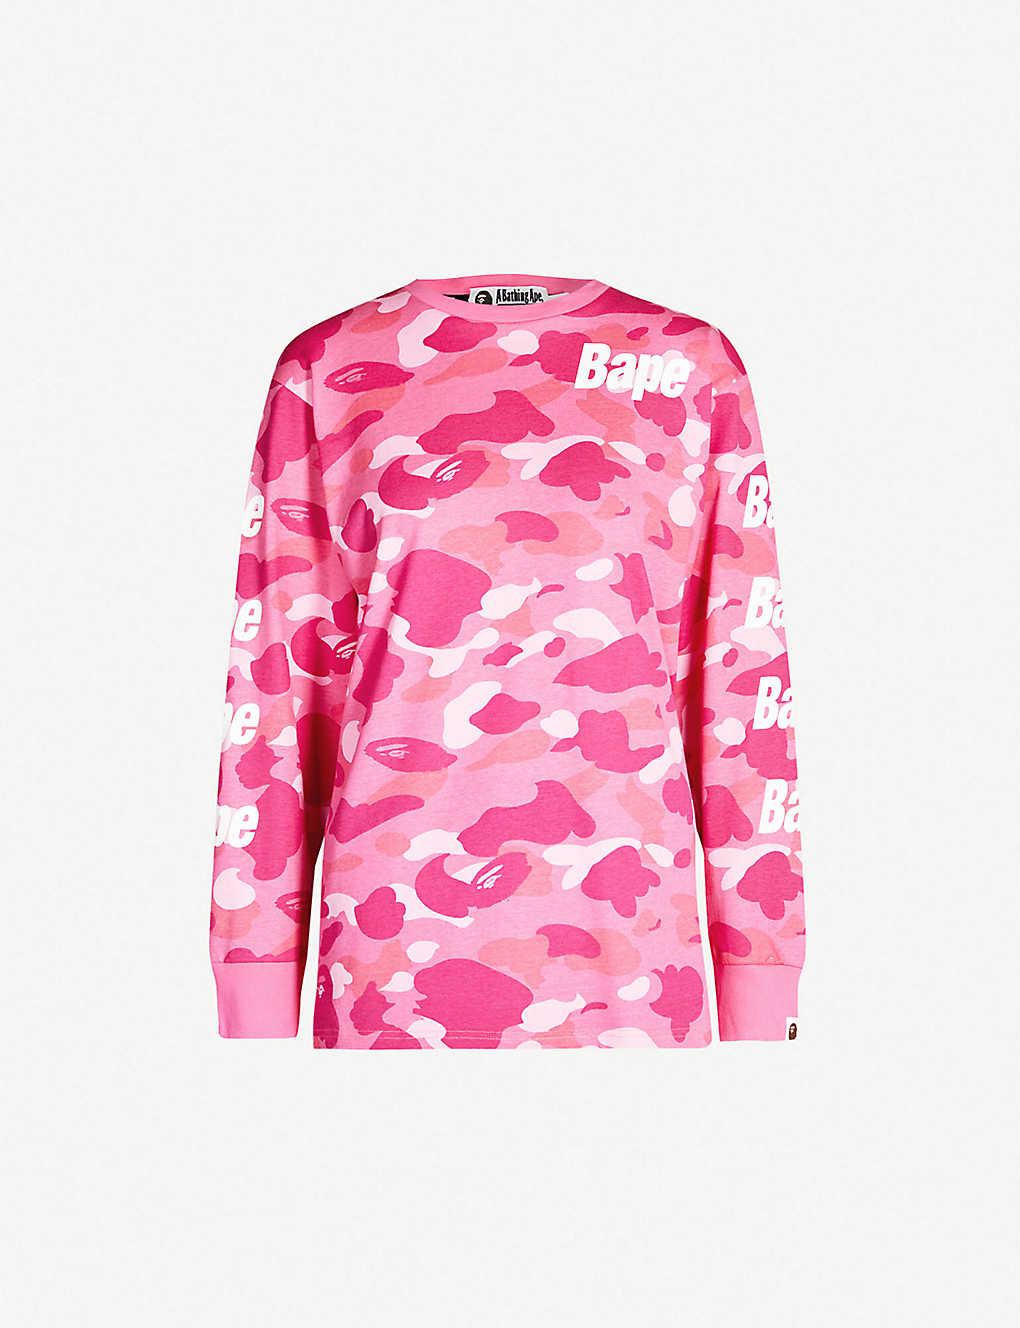 a73016ab BAPE - Camouflage branded sleeve cotton-jersey T-shirt | Selfridges.com